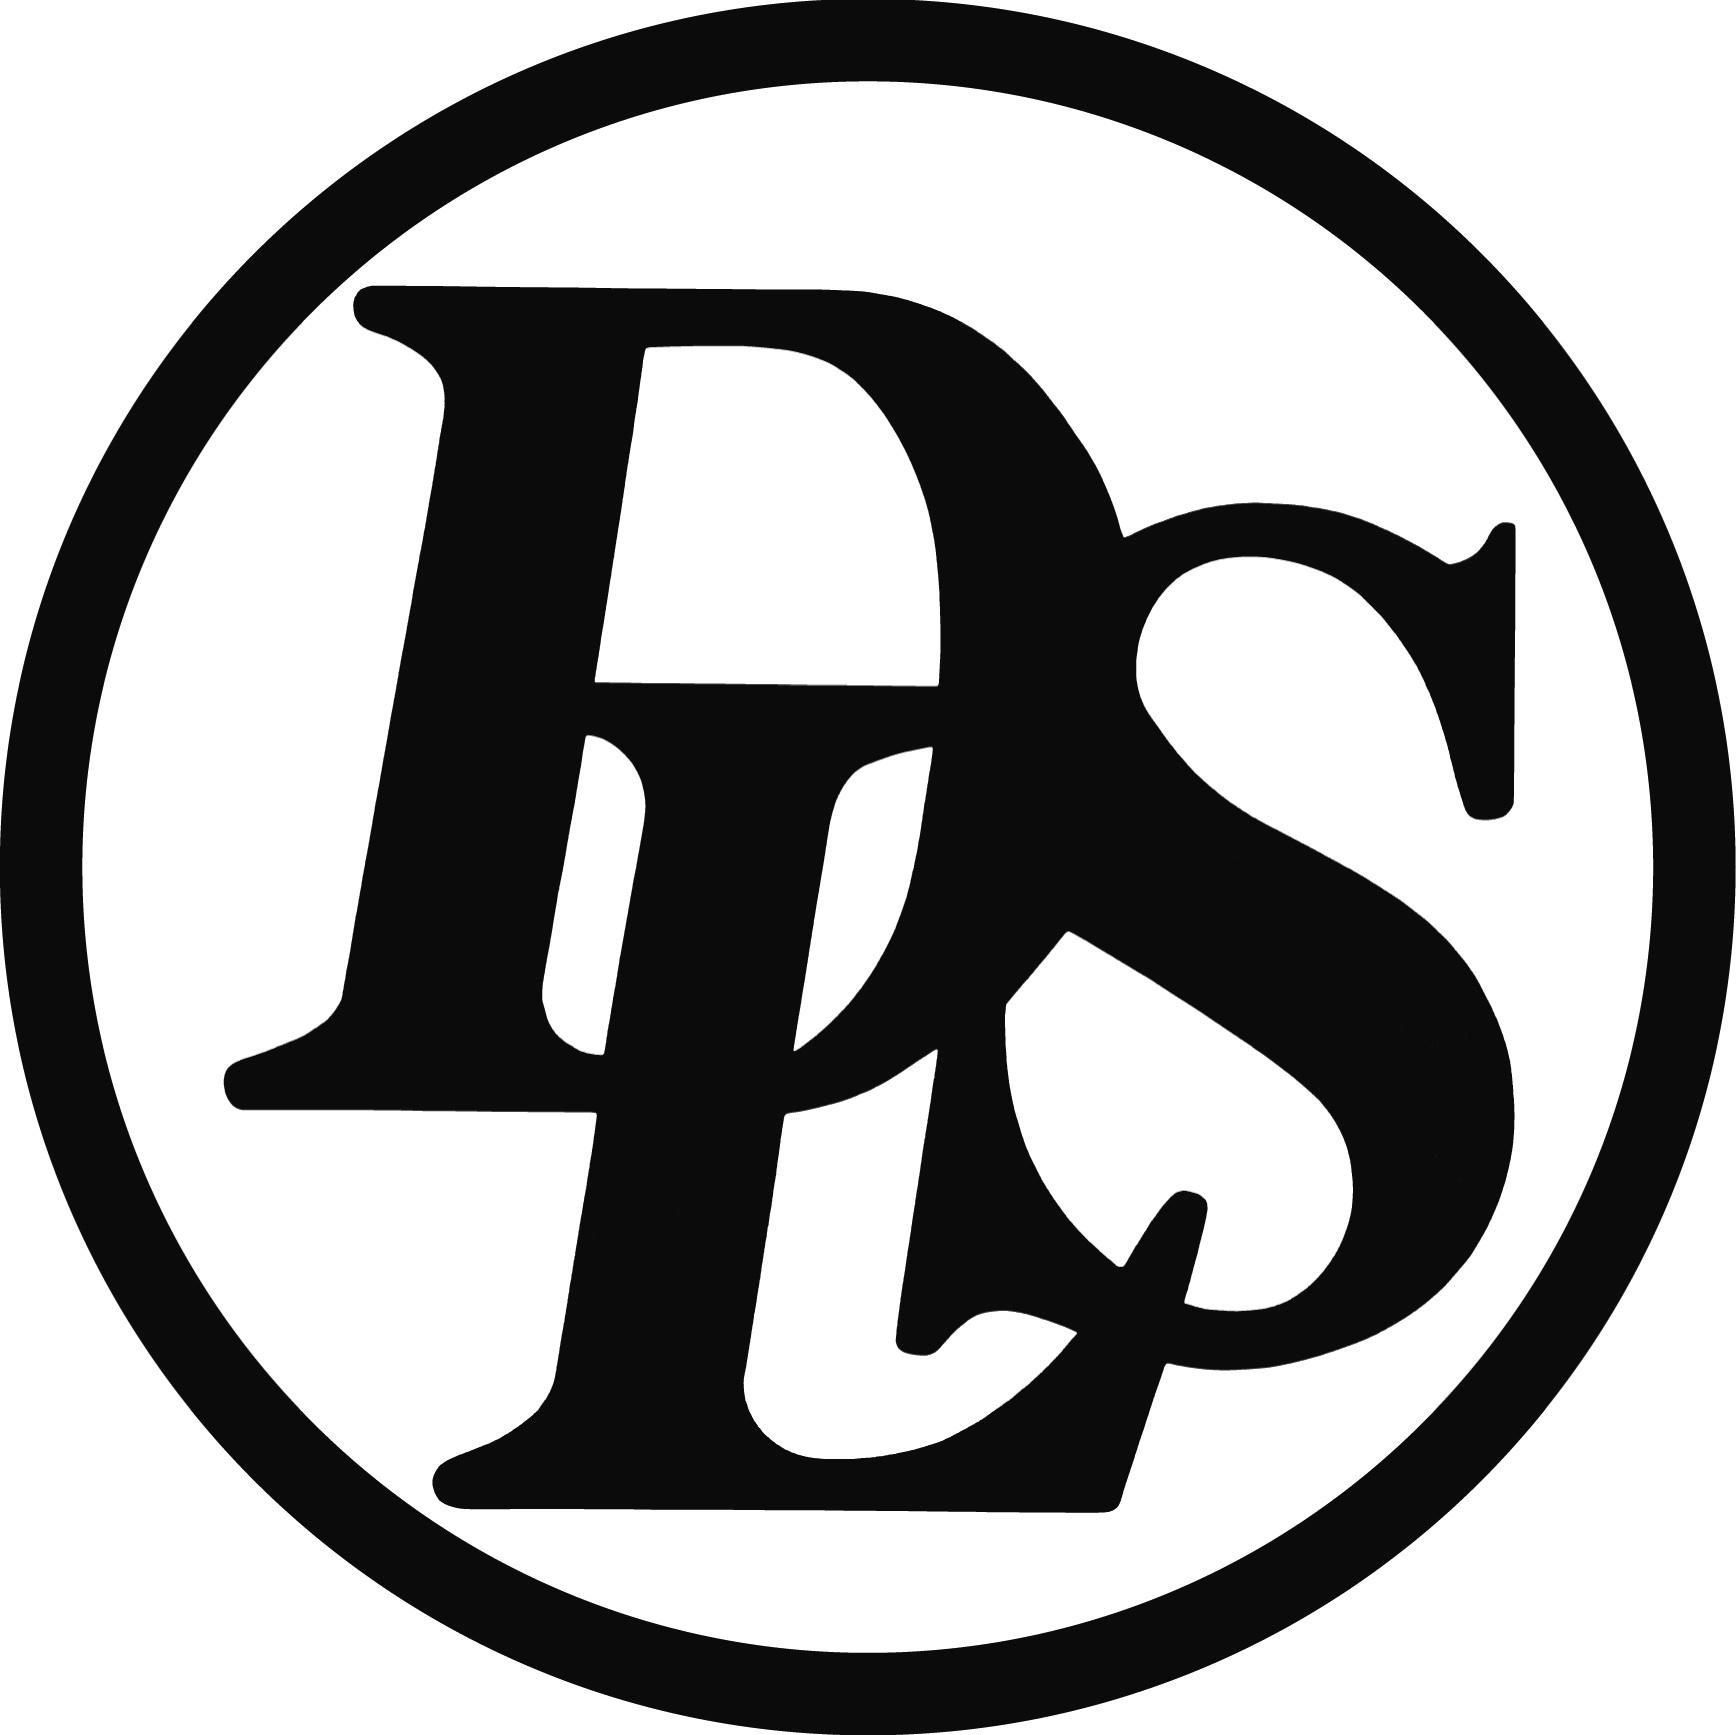 DLS Logo Wallpaper